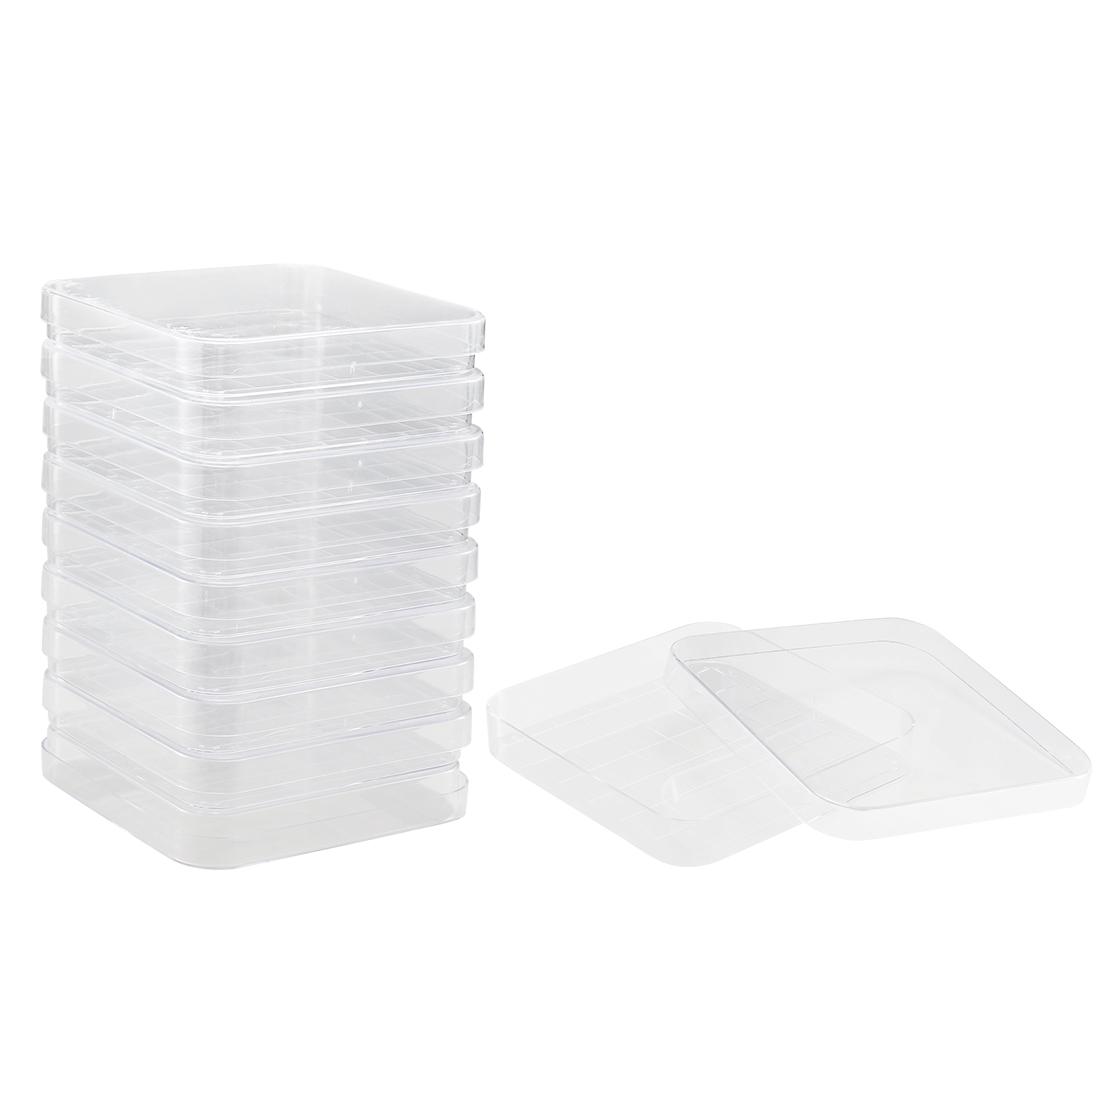 Plastic Square Integrid Petri Dish Plates, 100mm x 100mm, 17mm Height, 10 Pack